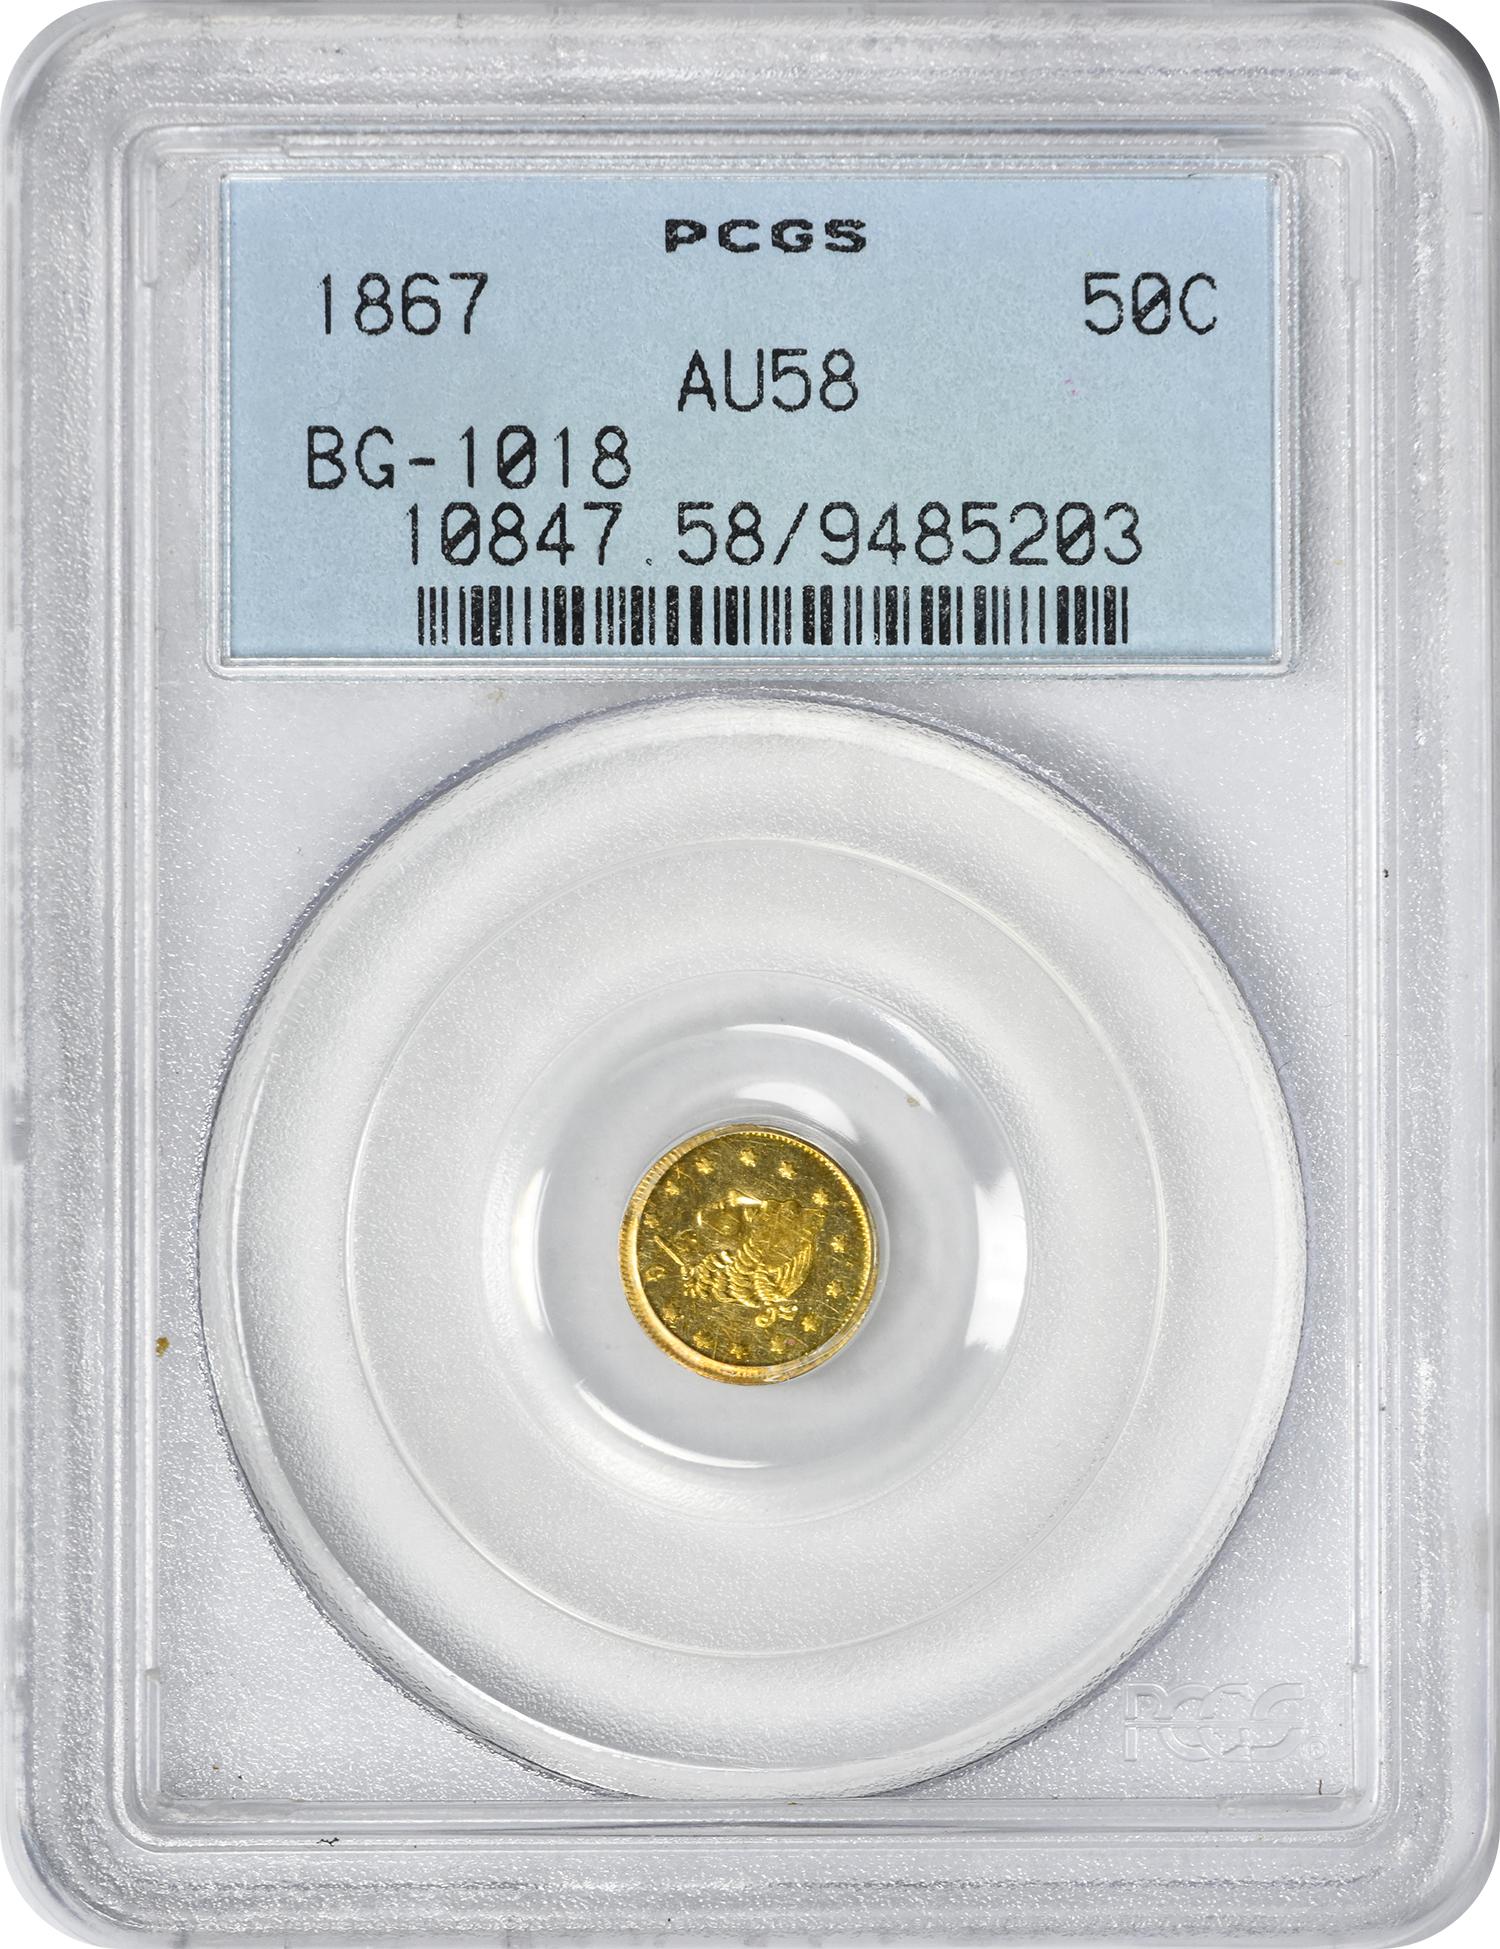 1867 Half Dollar California Gold, BG-1018, AU58, PCGS